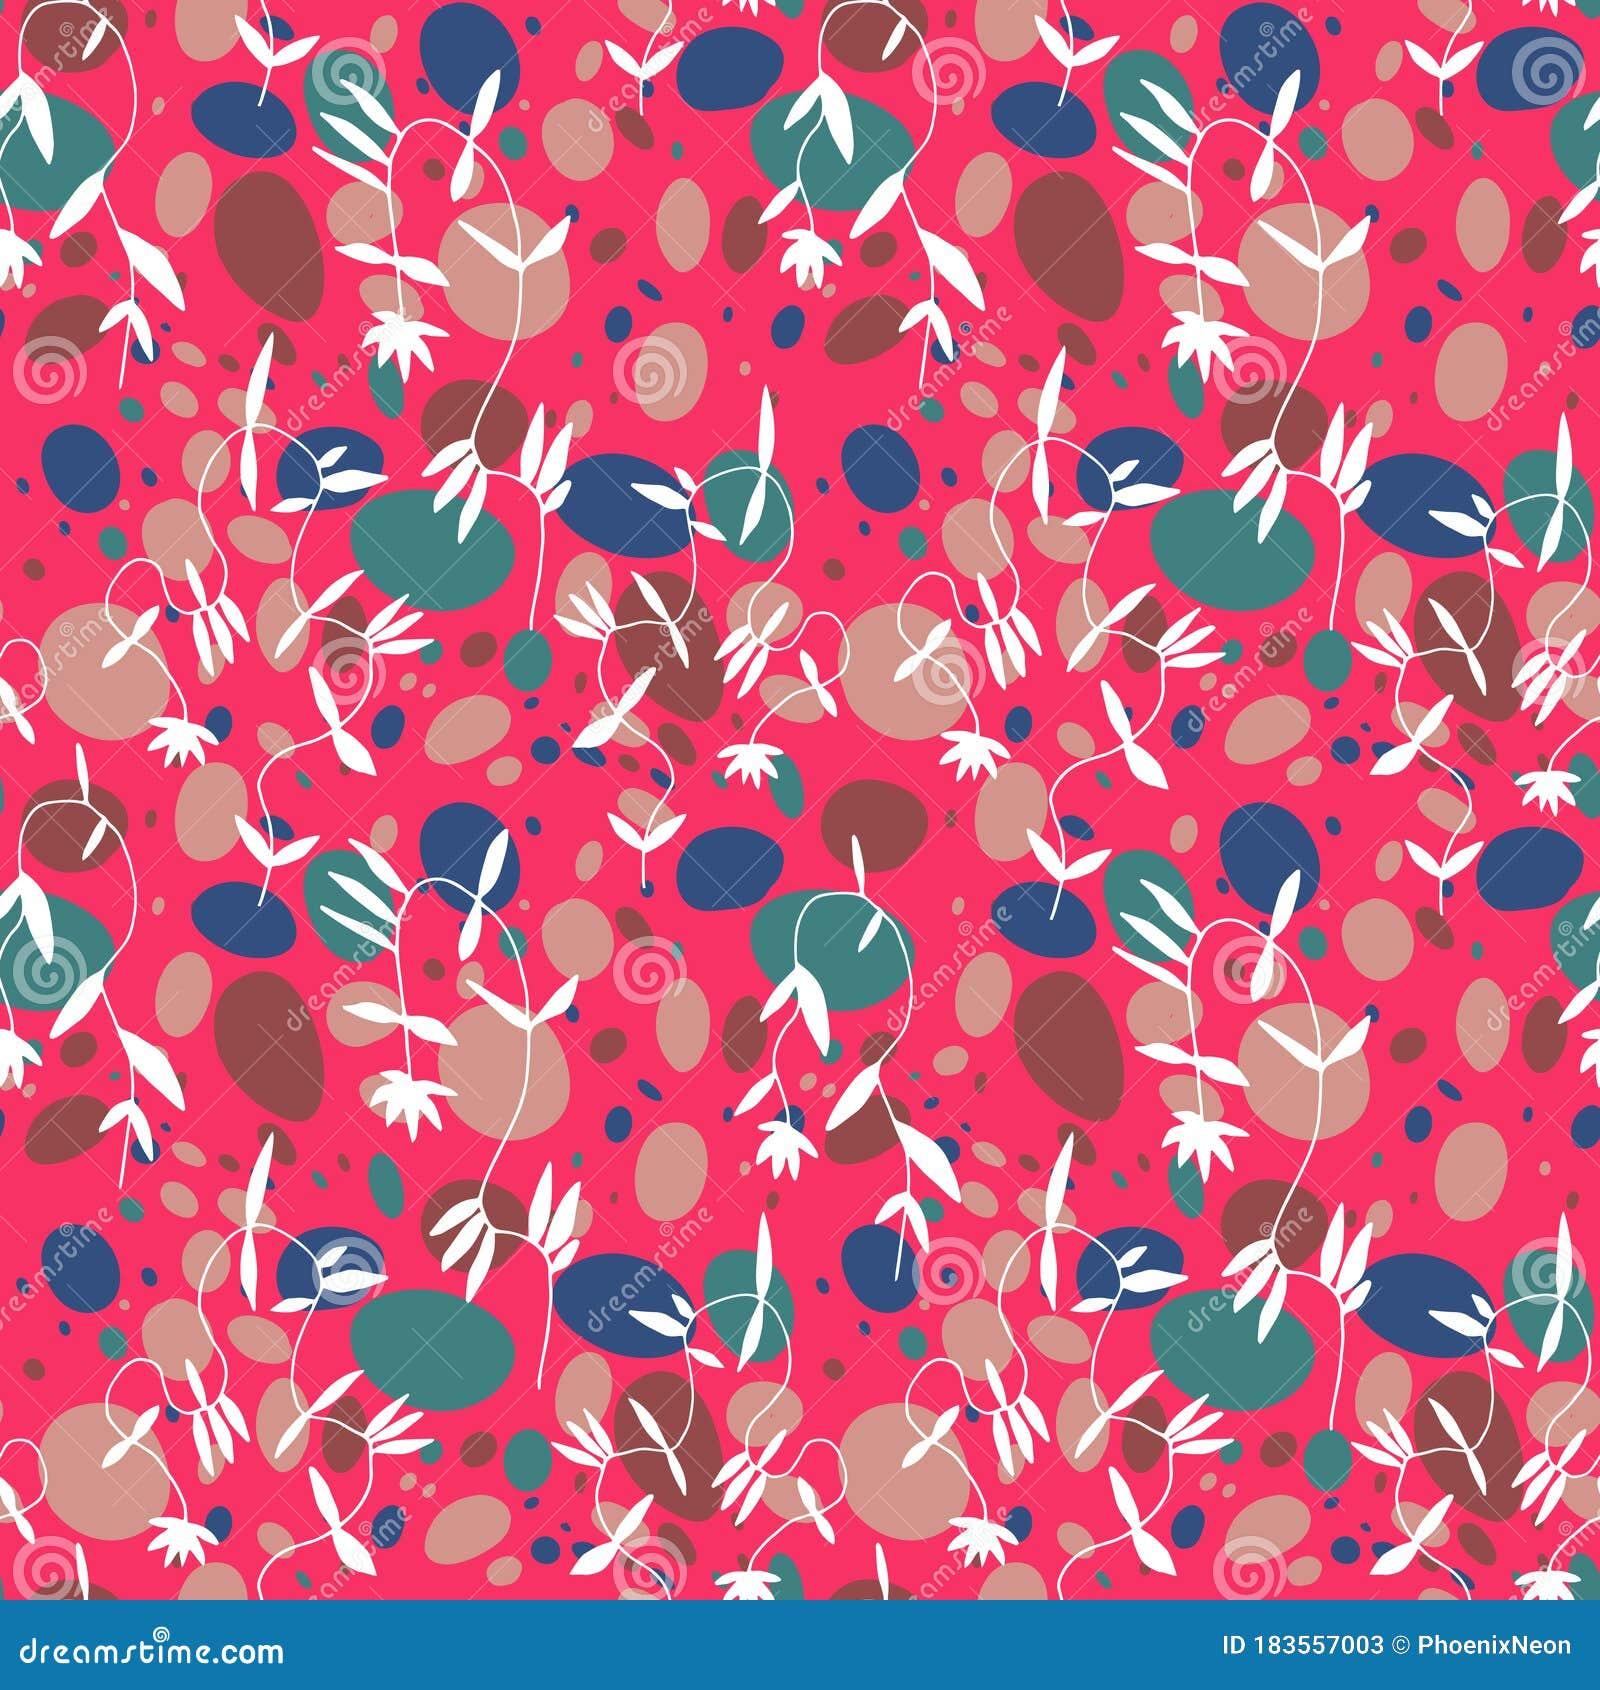 Little Flower Seamless Pattern In Vintage Scandinavian Minimalism Aesthetic Retro Background Stock Vector Illustration Of Blot Memphis 183557003